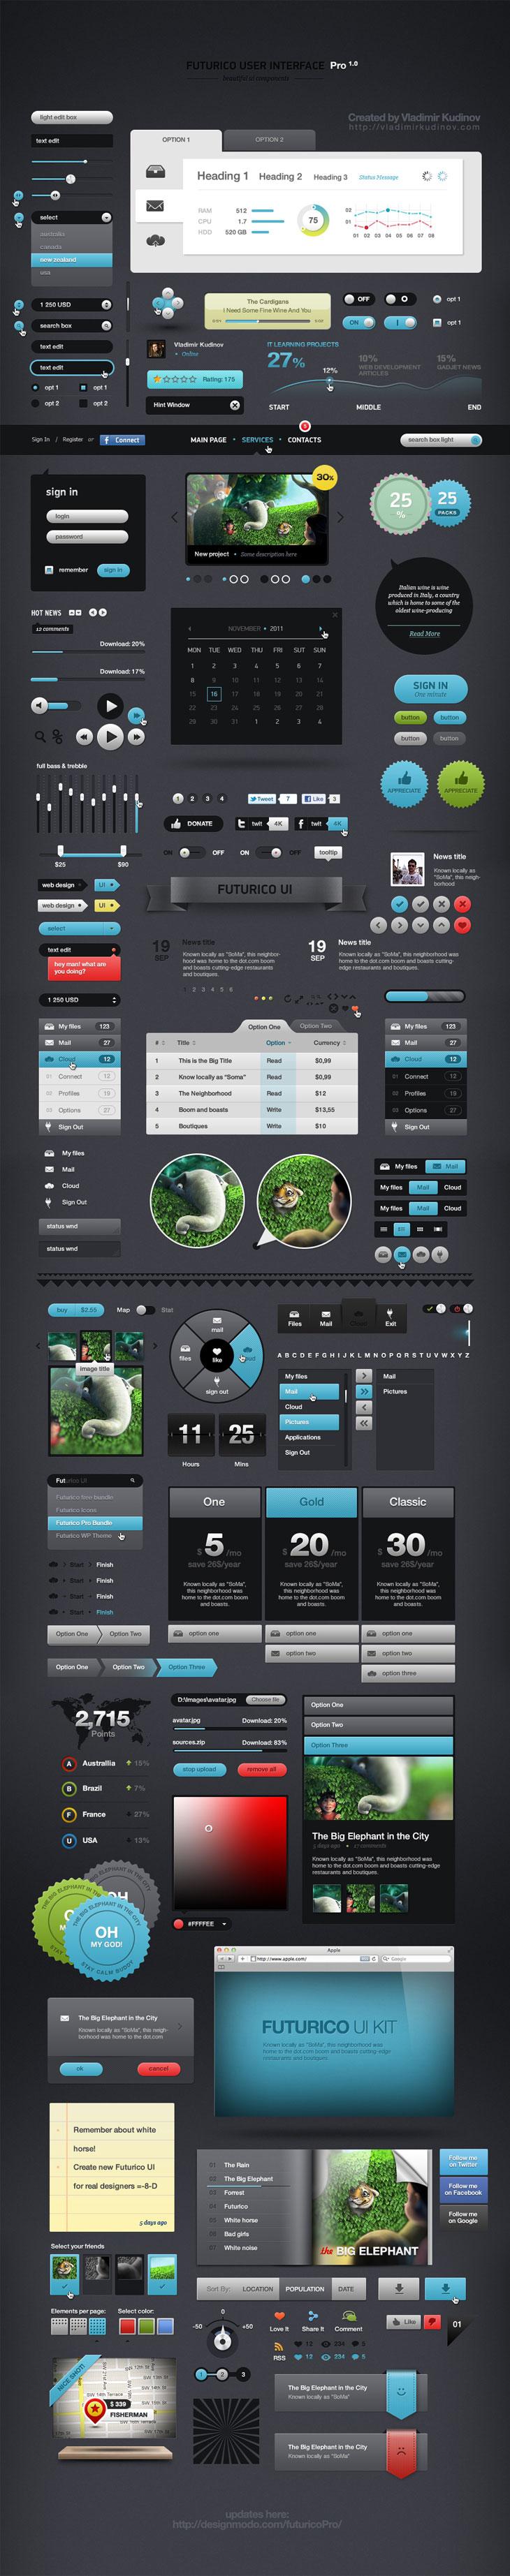 Futurico UI Pro Advanced User Interface Elements